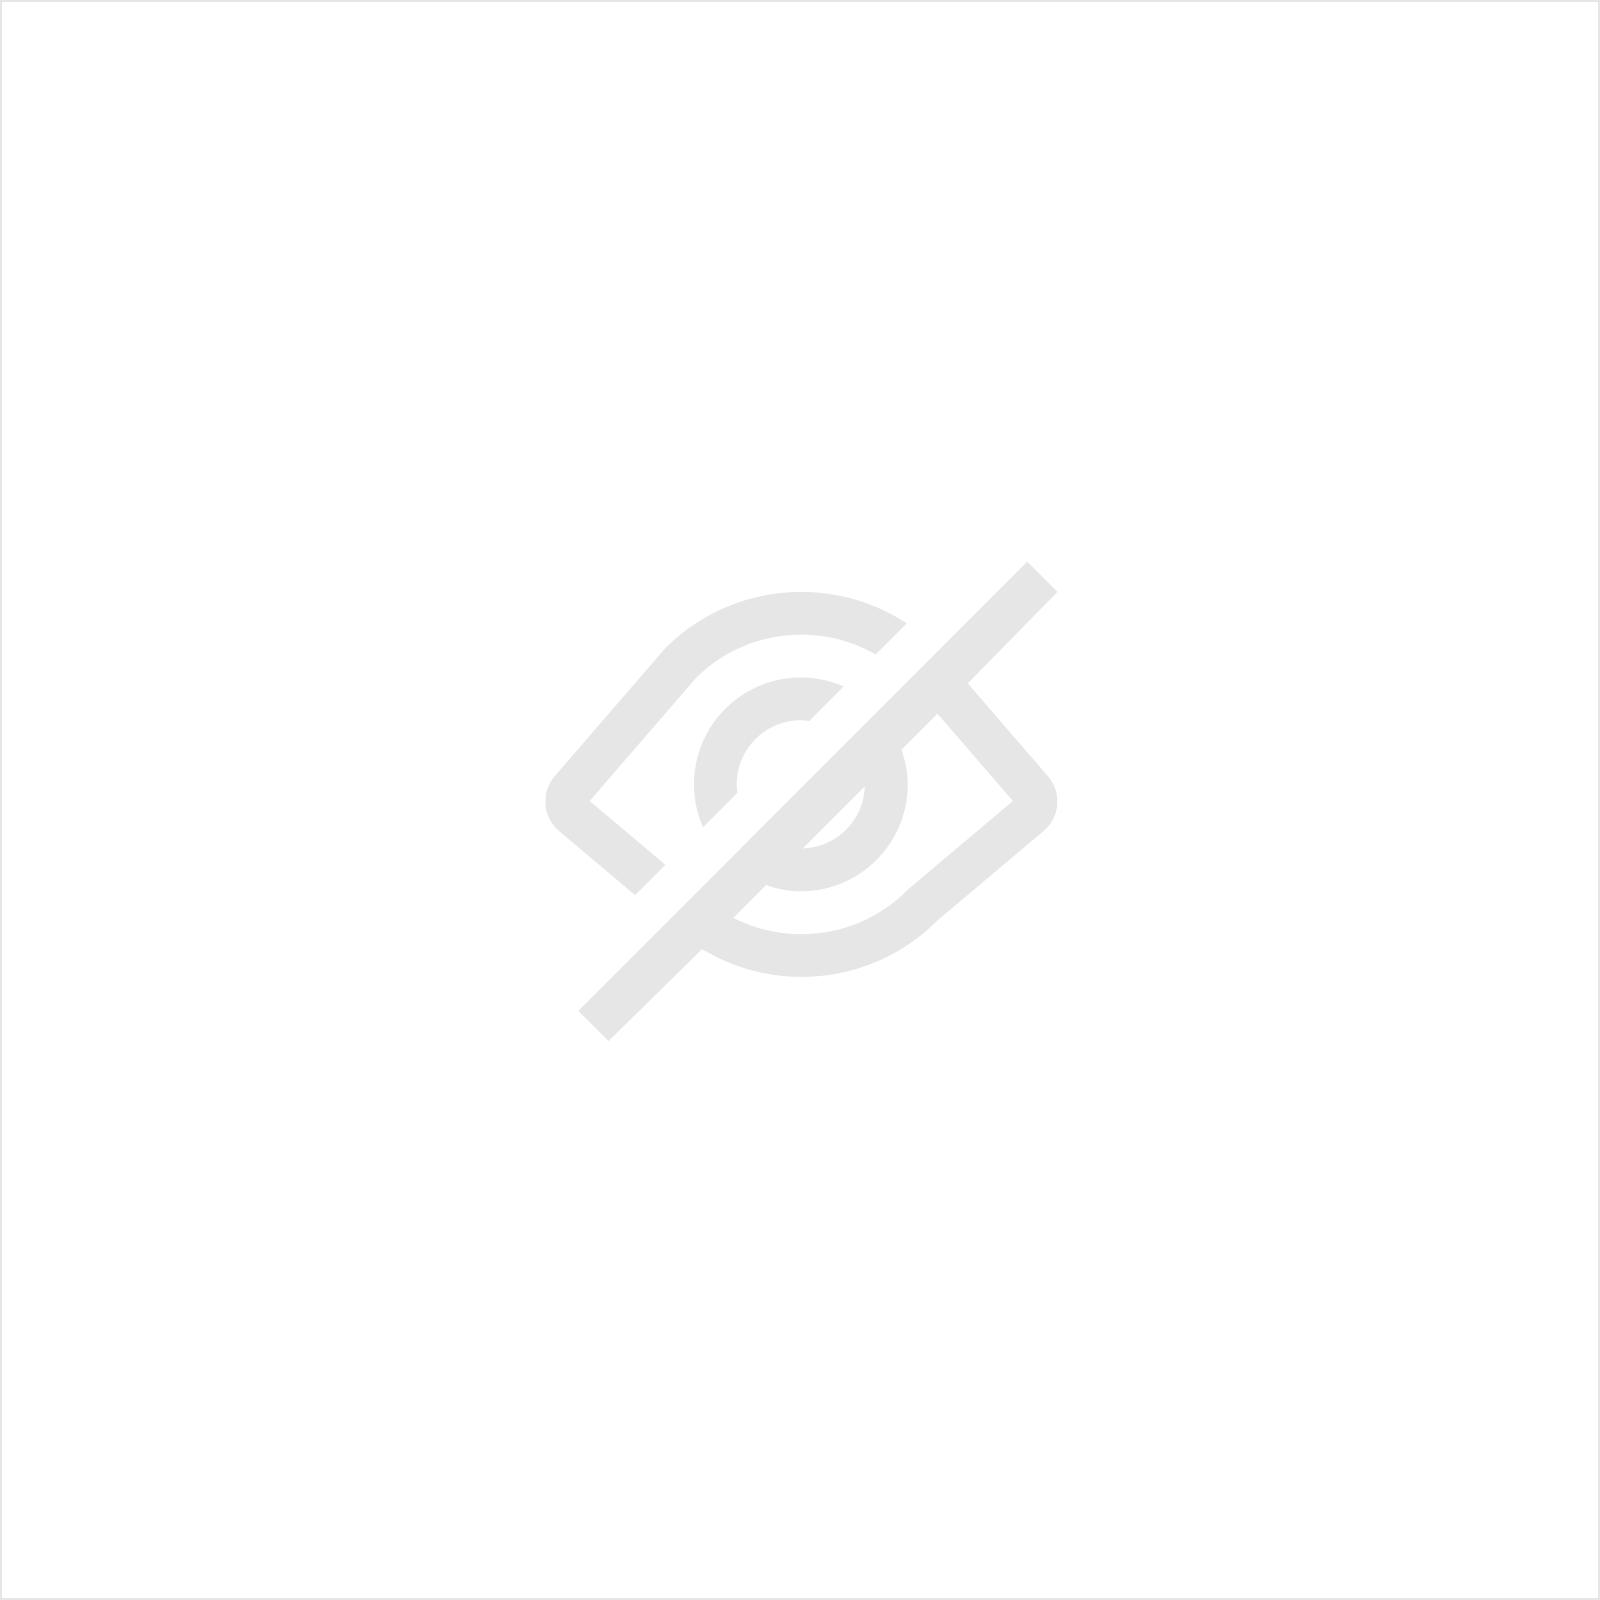 COMPLETE KIT OM TE VERZINKEN  (Zinga Kit Complet)